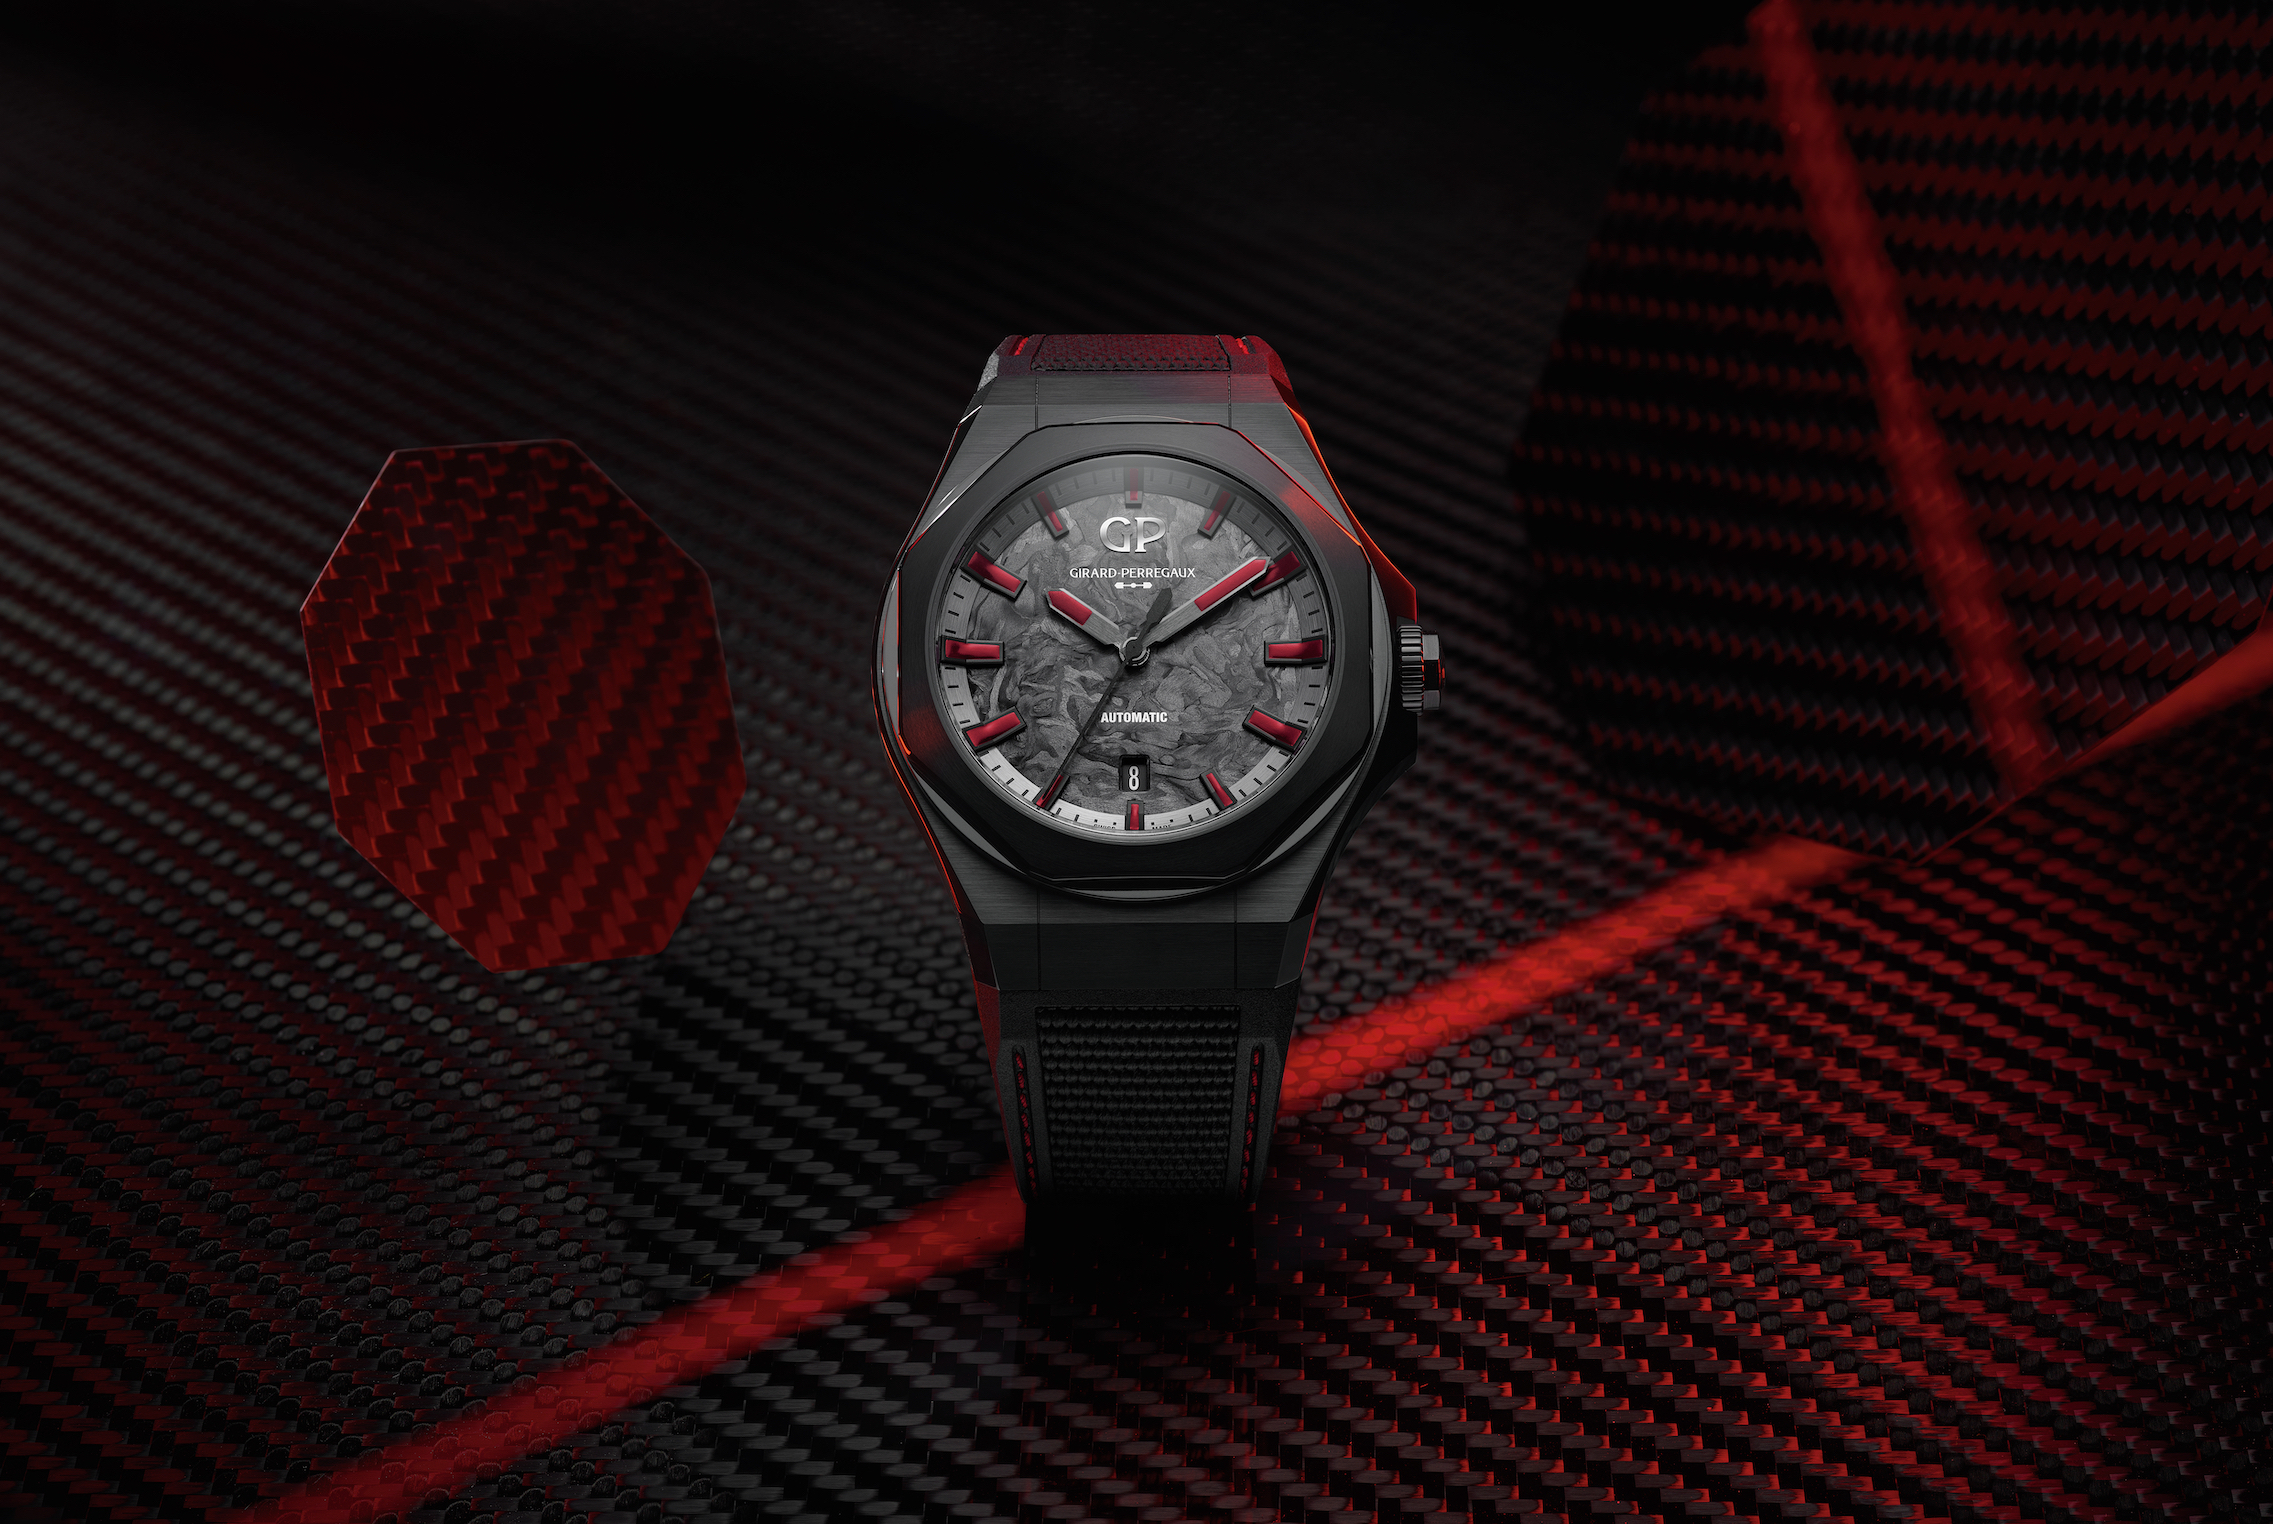 Girard-Perregaux Laureato Absolute Infrared